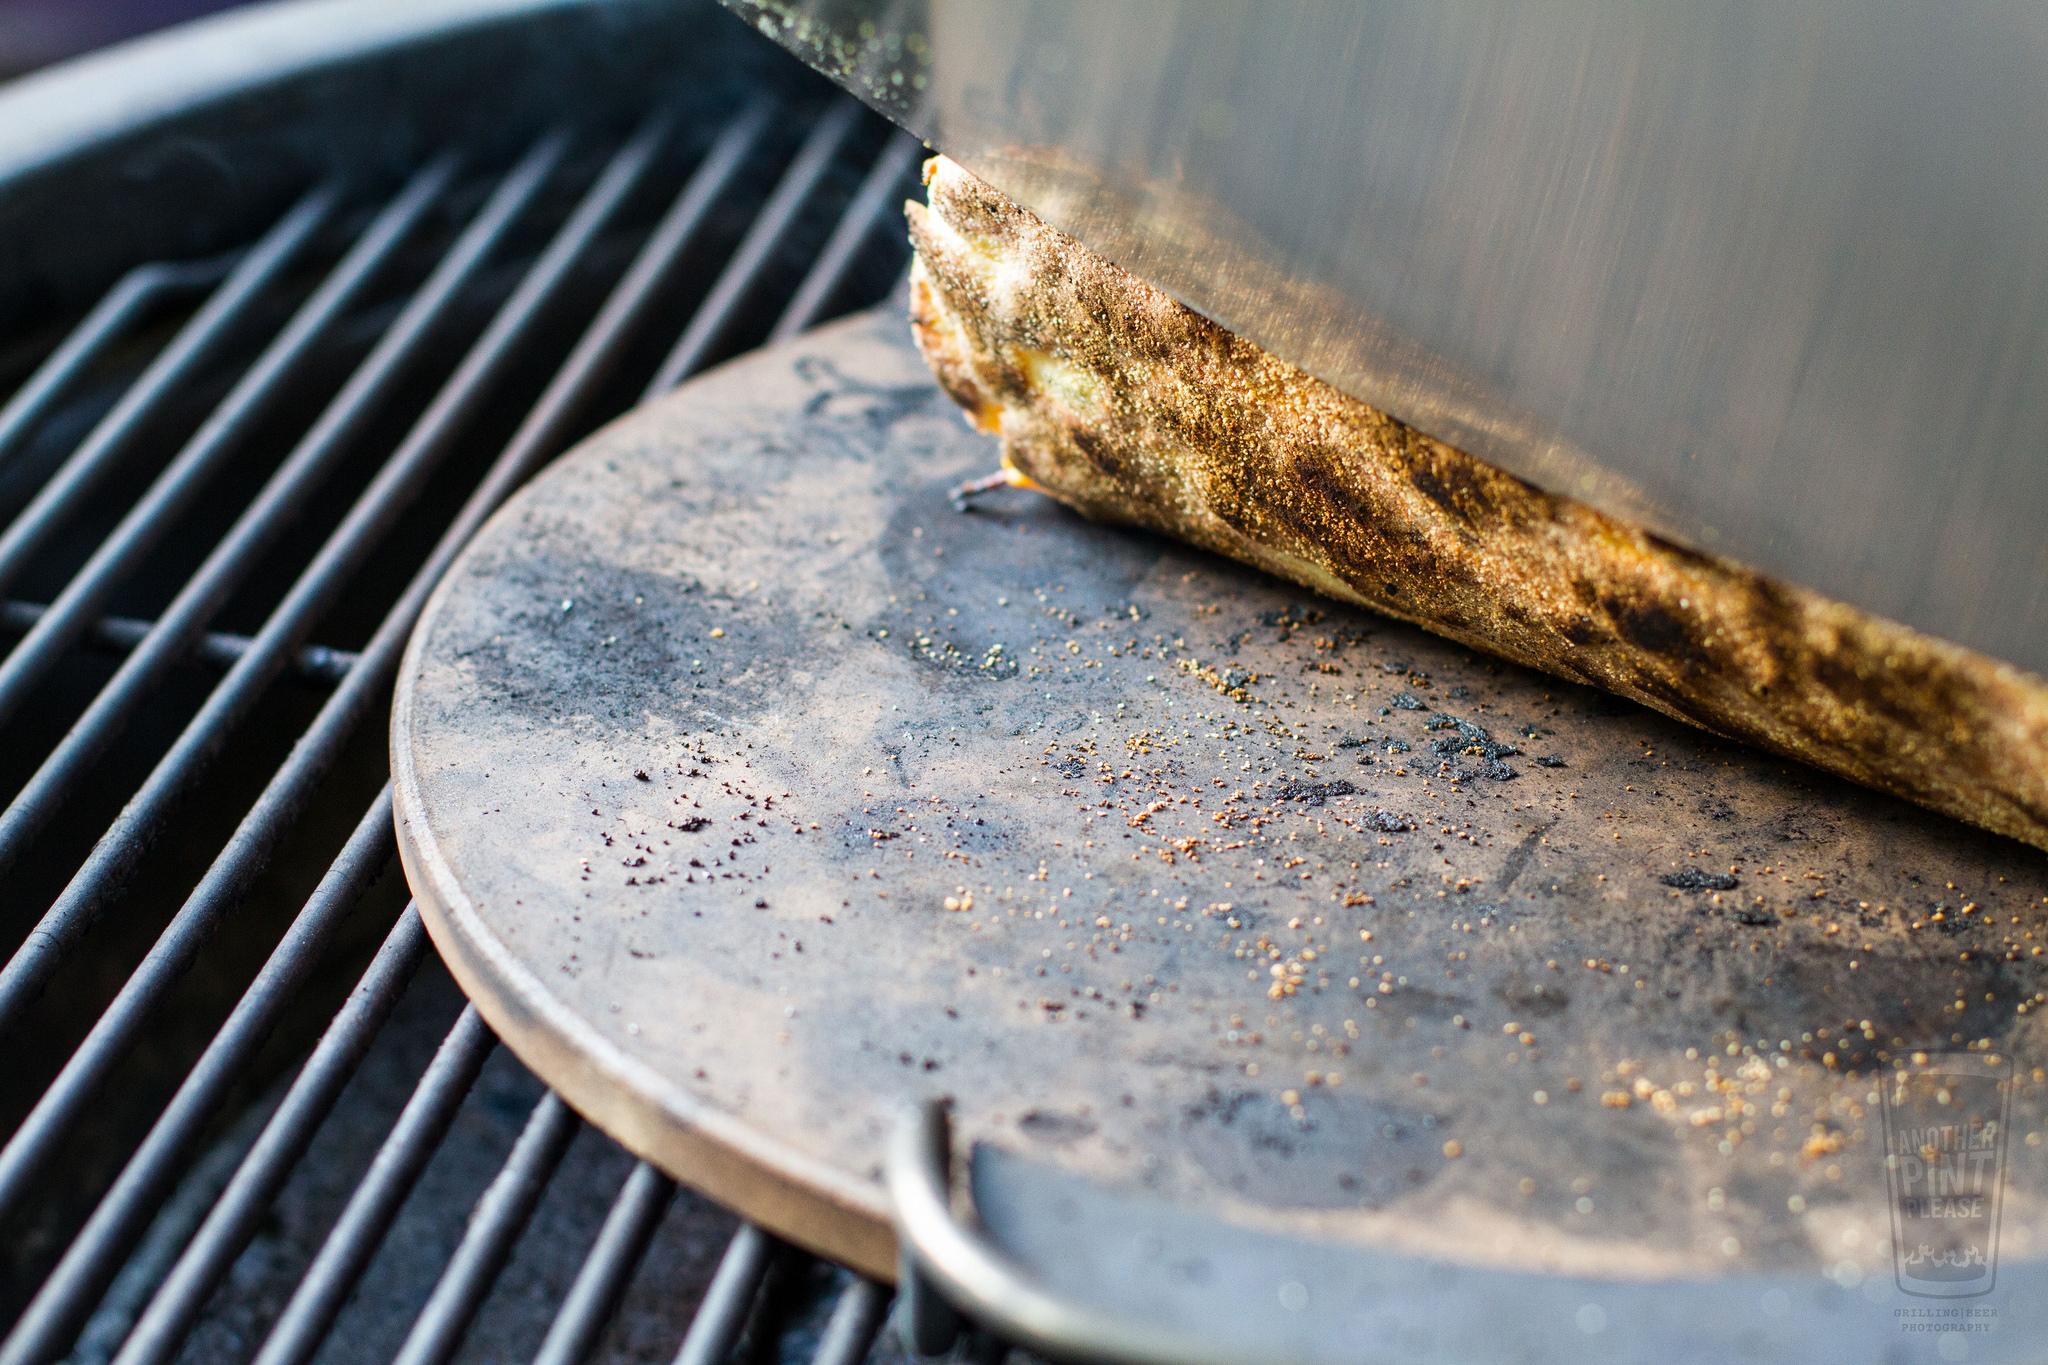 pizza crust on weber summit charcoal grill.jpg